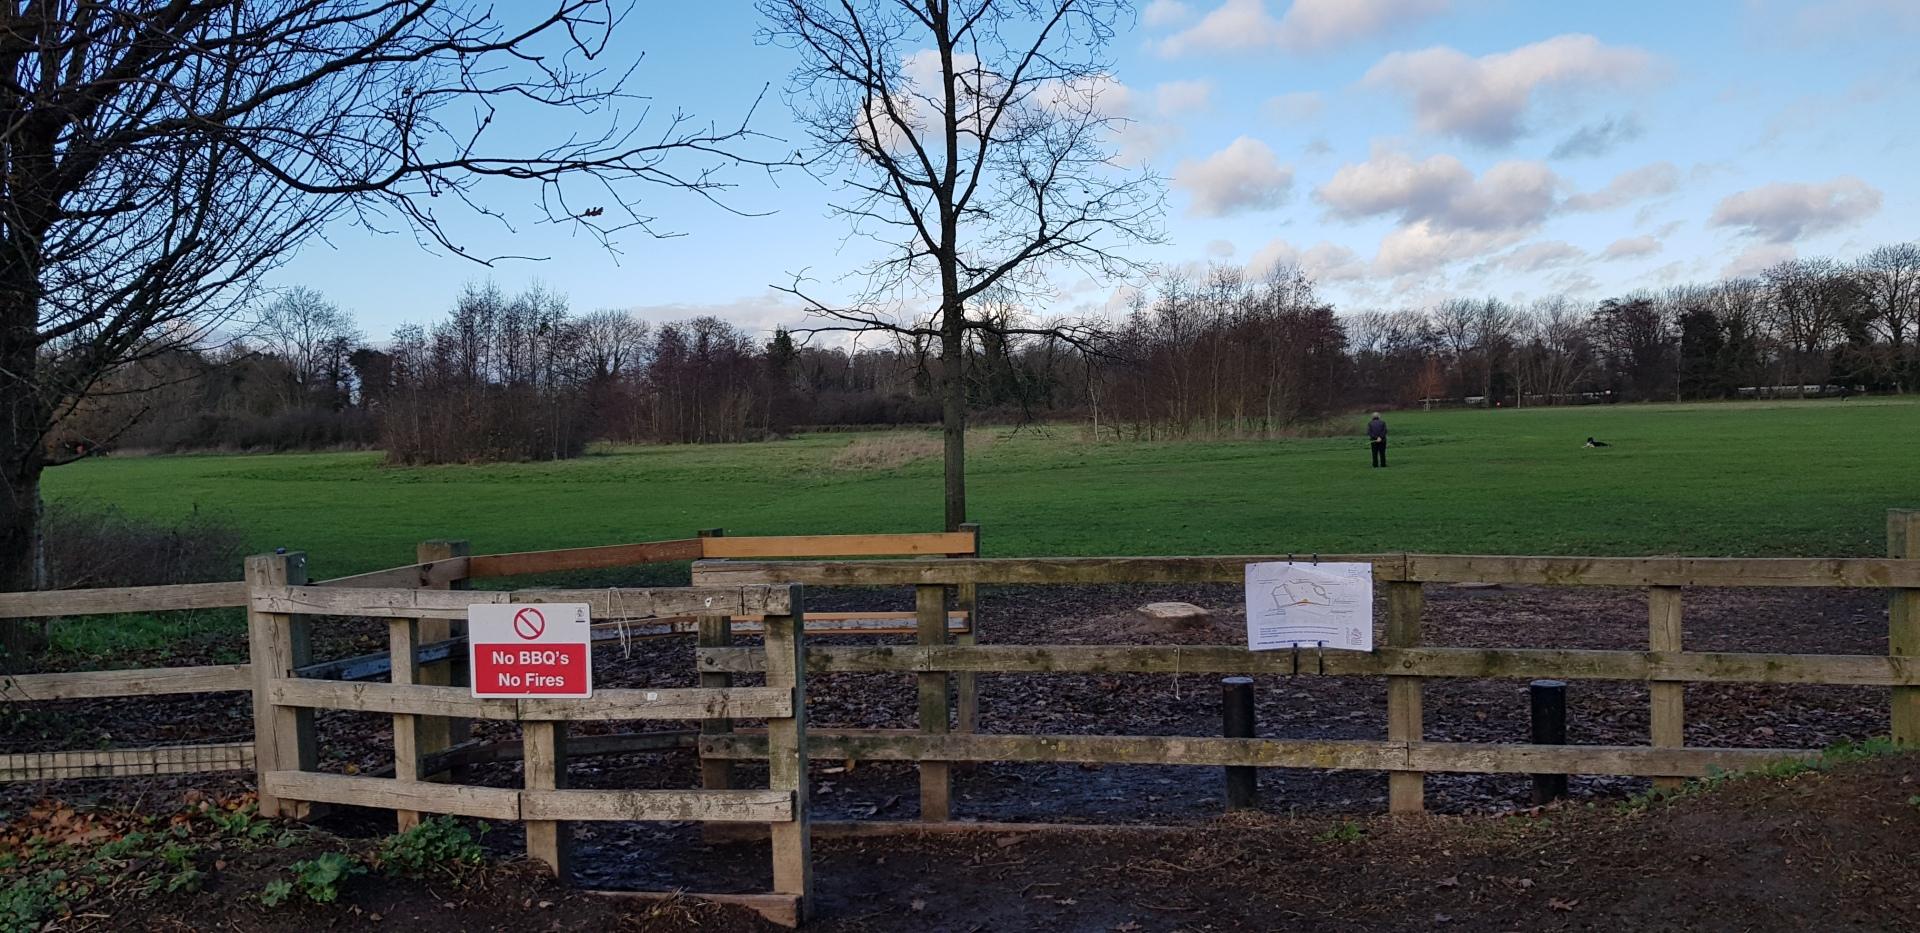 sutherland grange trees gone